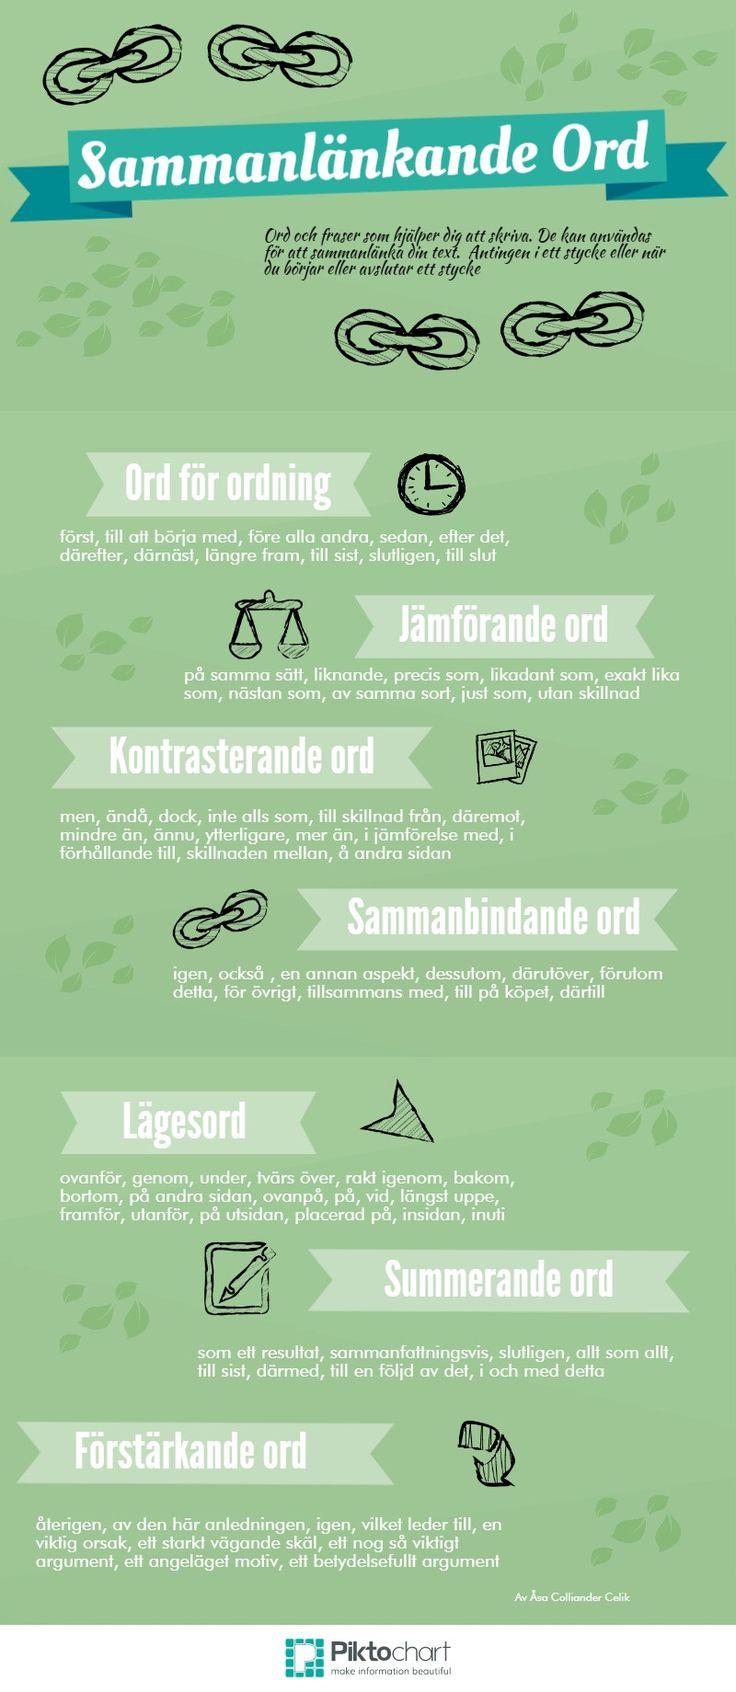 Sammanlänkande ord | @Piktochart Infographic